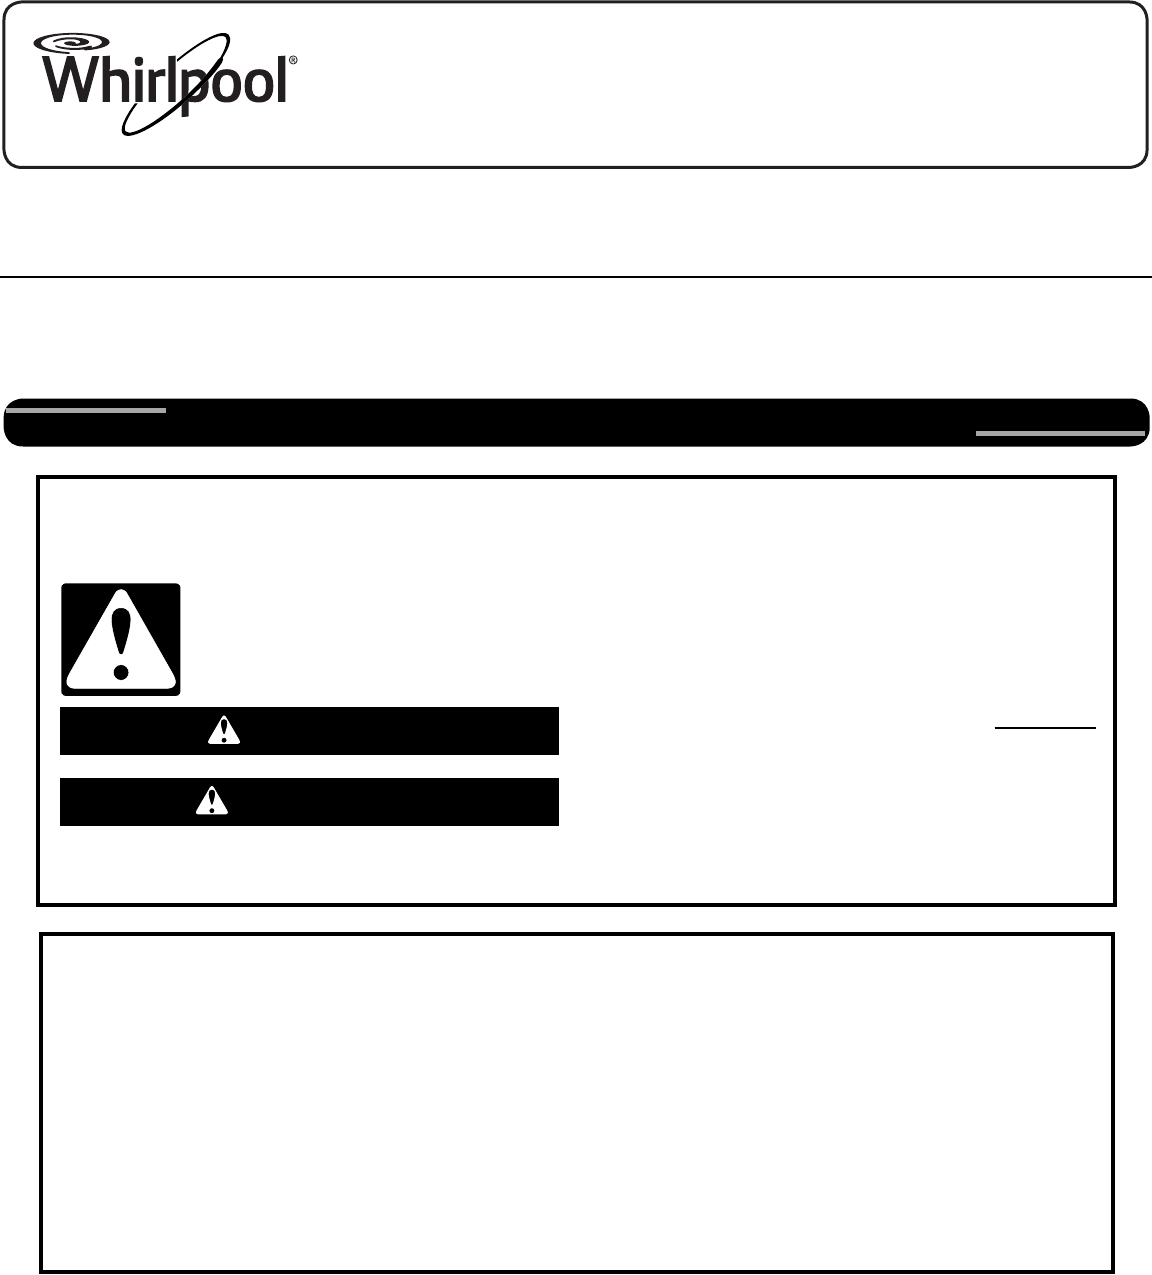 Whirlpool W10545082a Users Manual